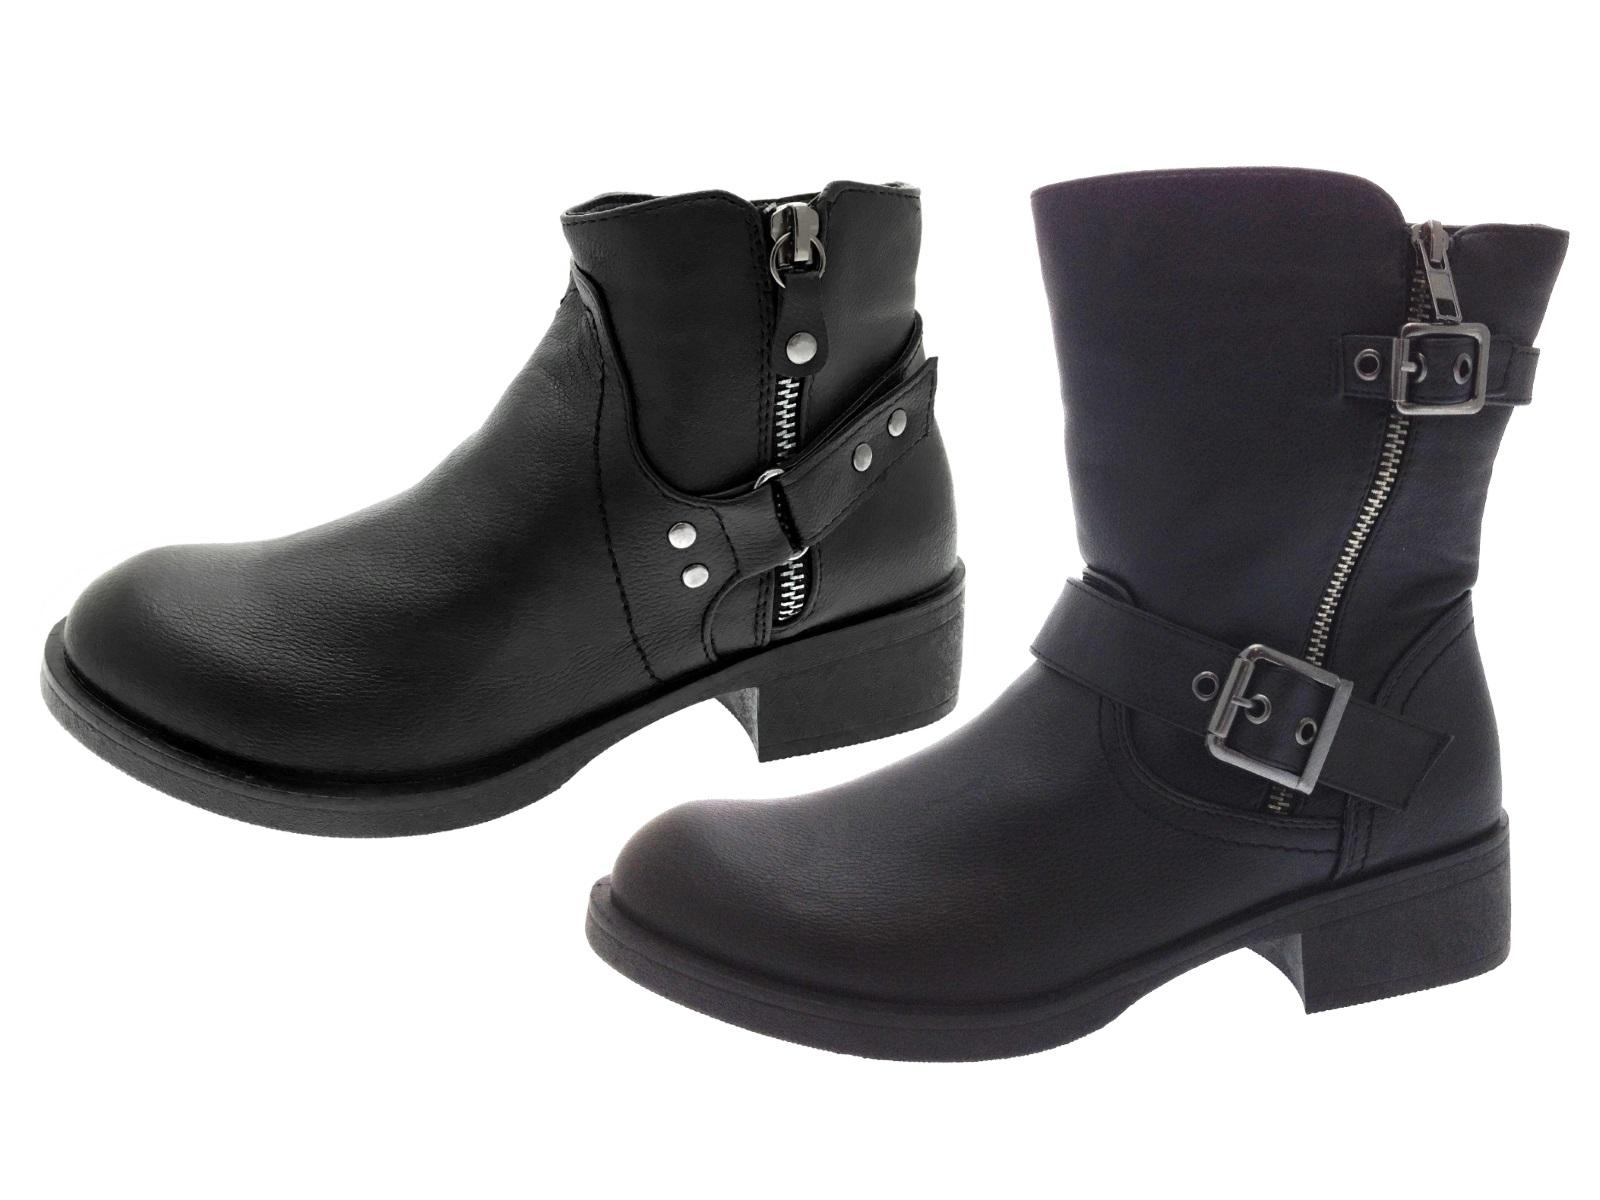 Elegant WOMENS BLACK FAUX LEATHER LADIES STUDDED SLOUCHY BIKER BOOTS SHOES SIZE 3-8 UK | EBay